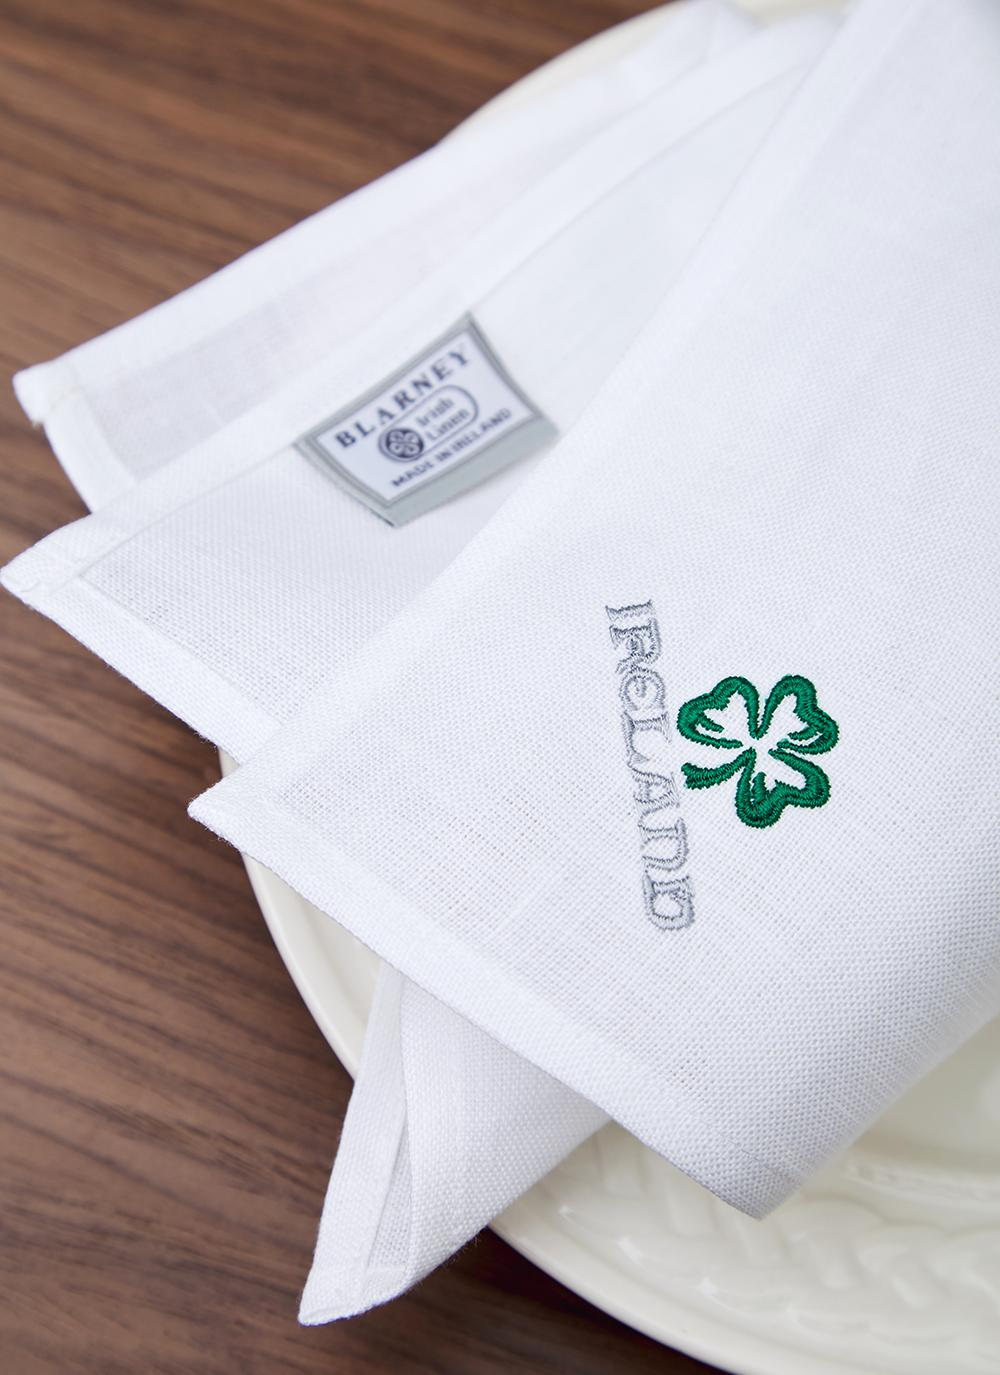 Blarney Irish Linen Embroidered Napkins 18 X 18 Blarney